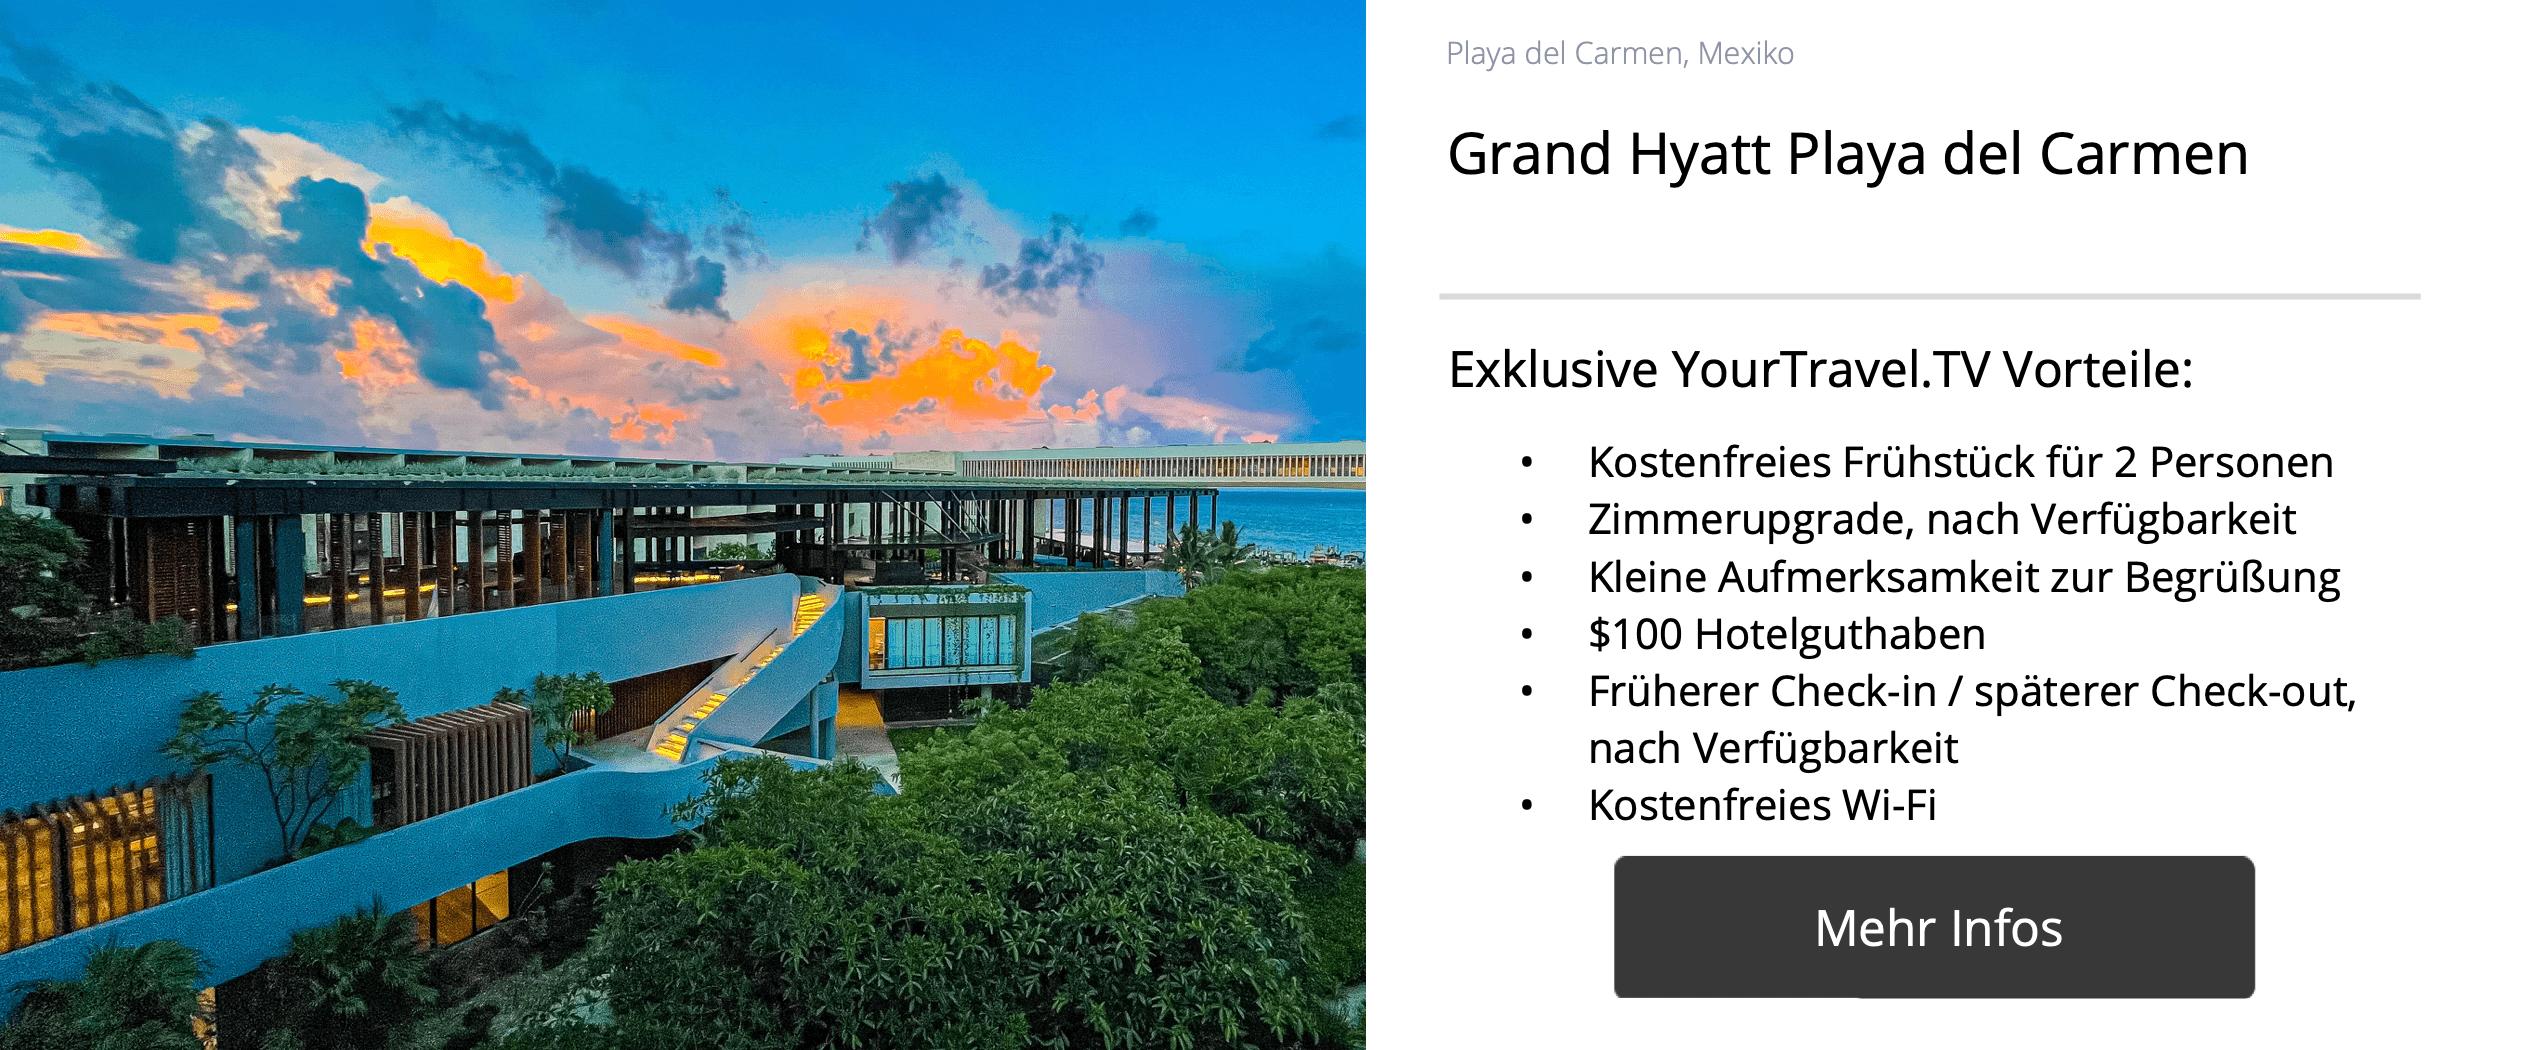 Grand Hyatt Playa del Carmen, YourTrave.TV Hotelsuche